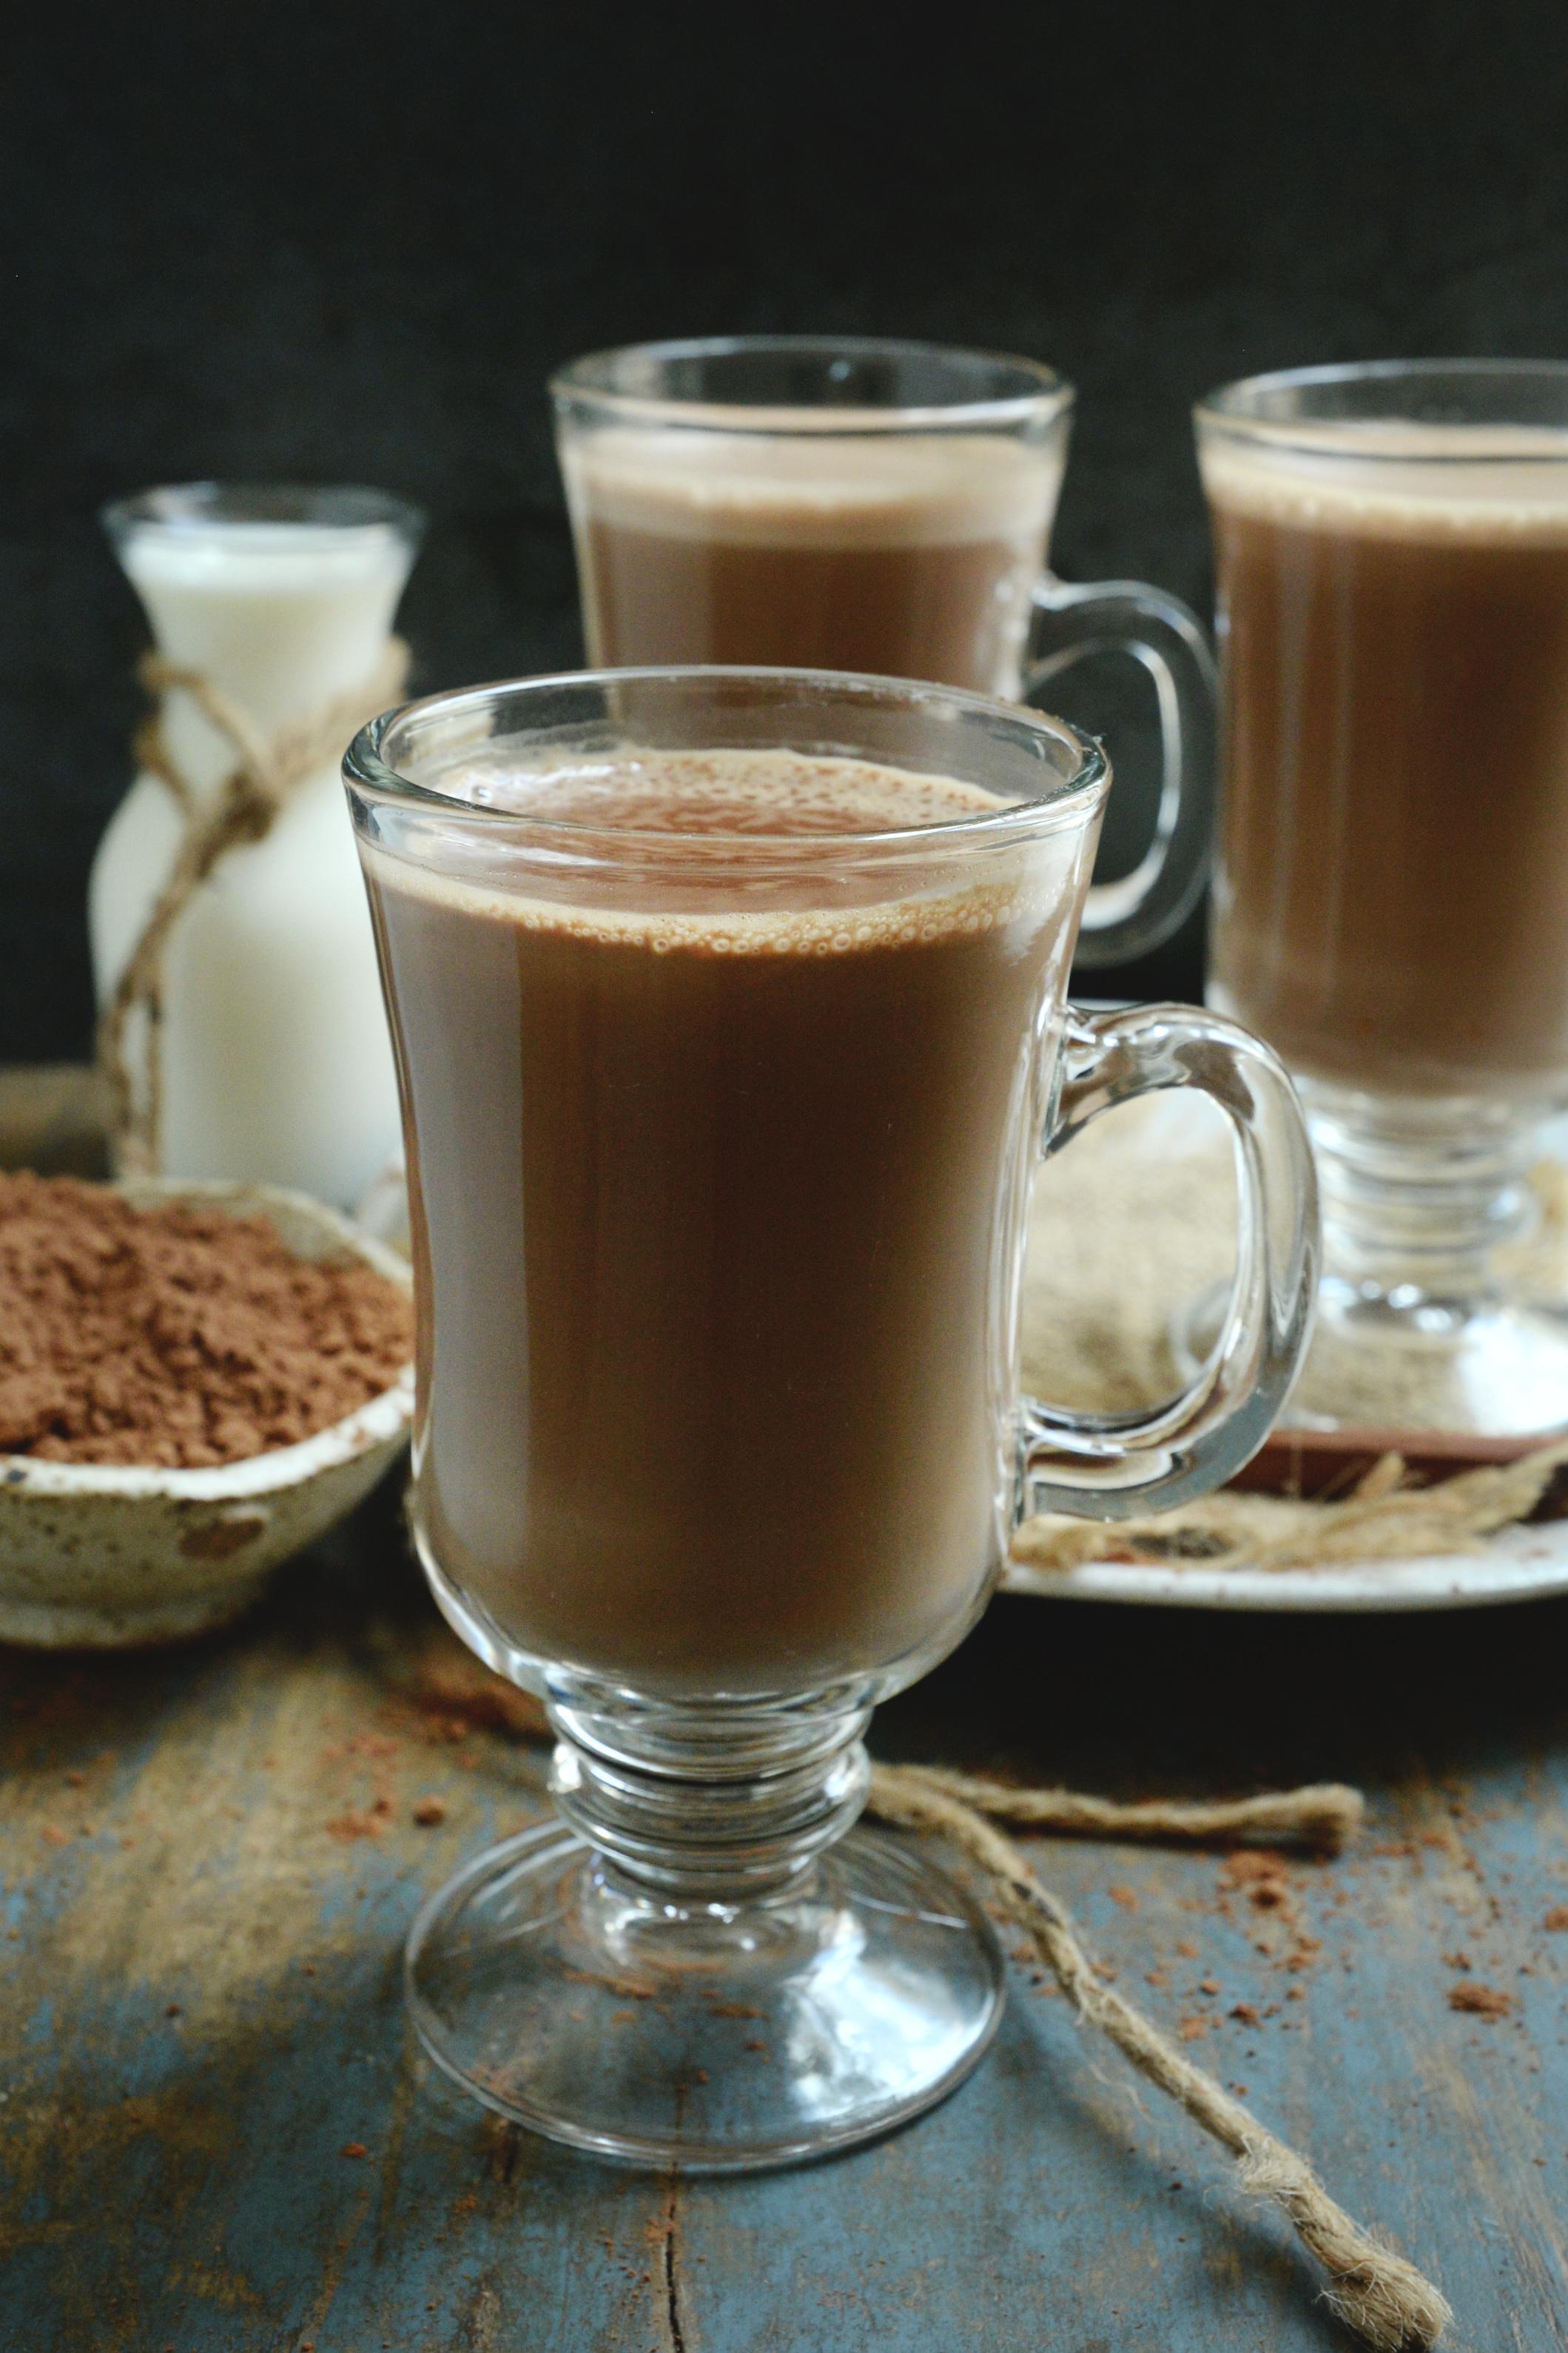 Keto-Friendly Sugar-Free Hot Chocolate Recipe -in a cup